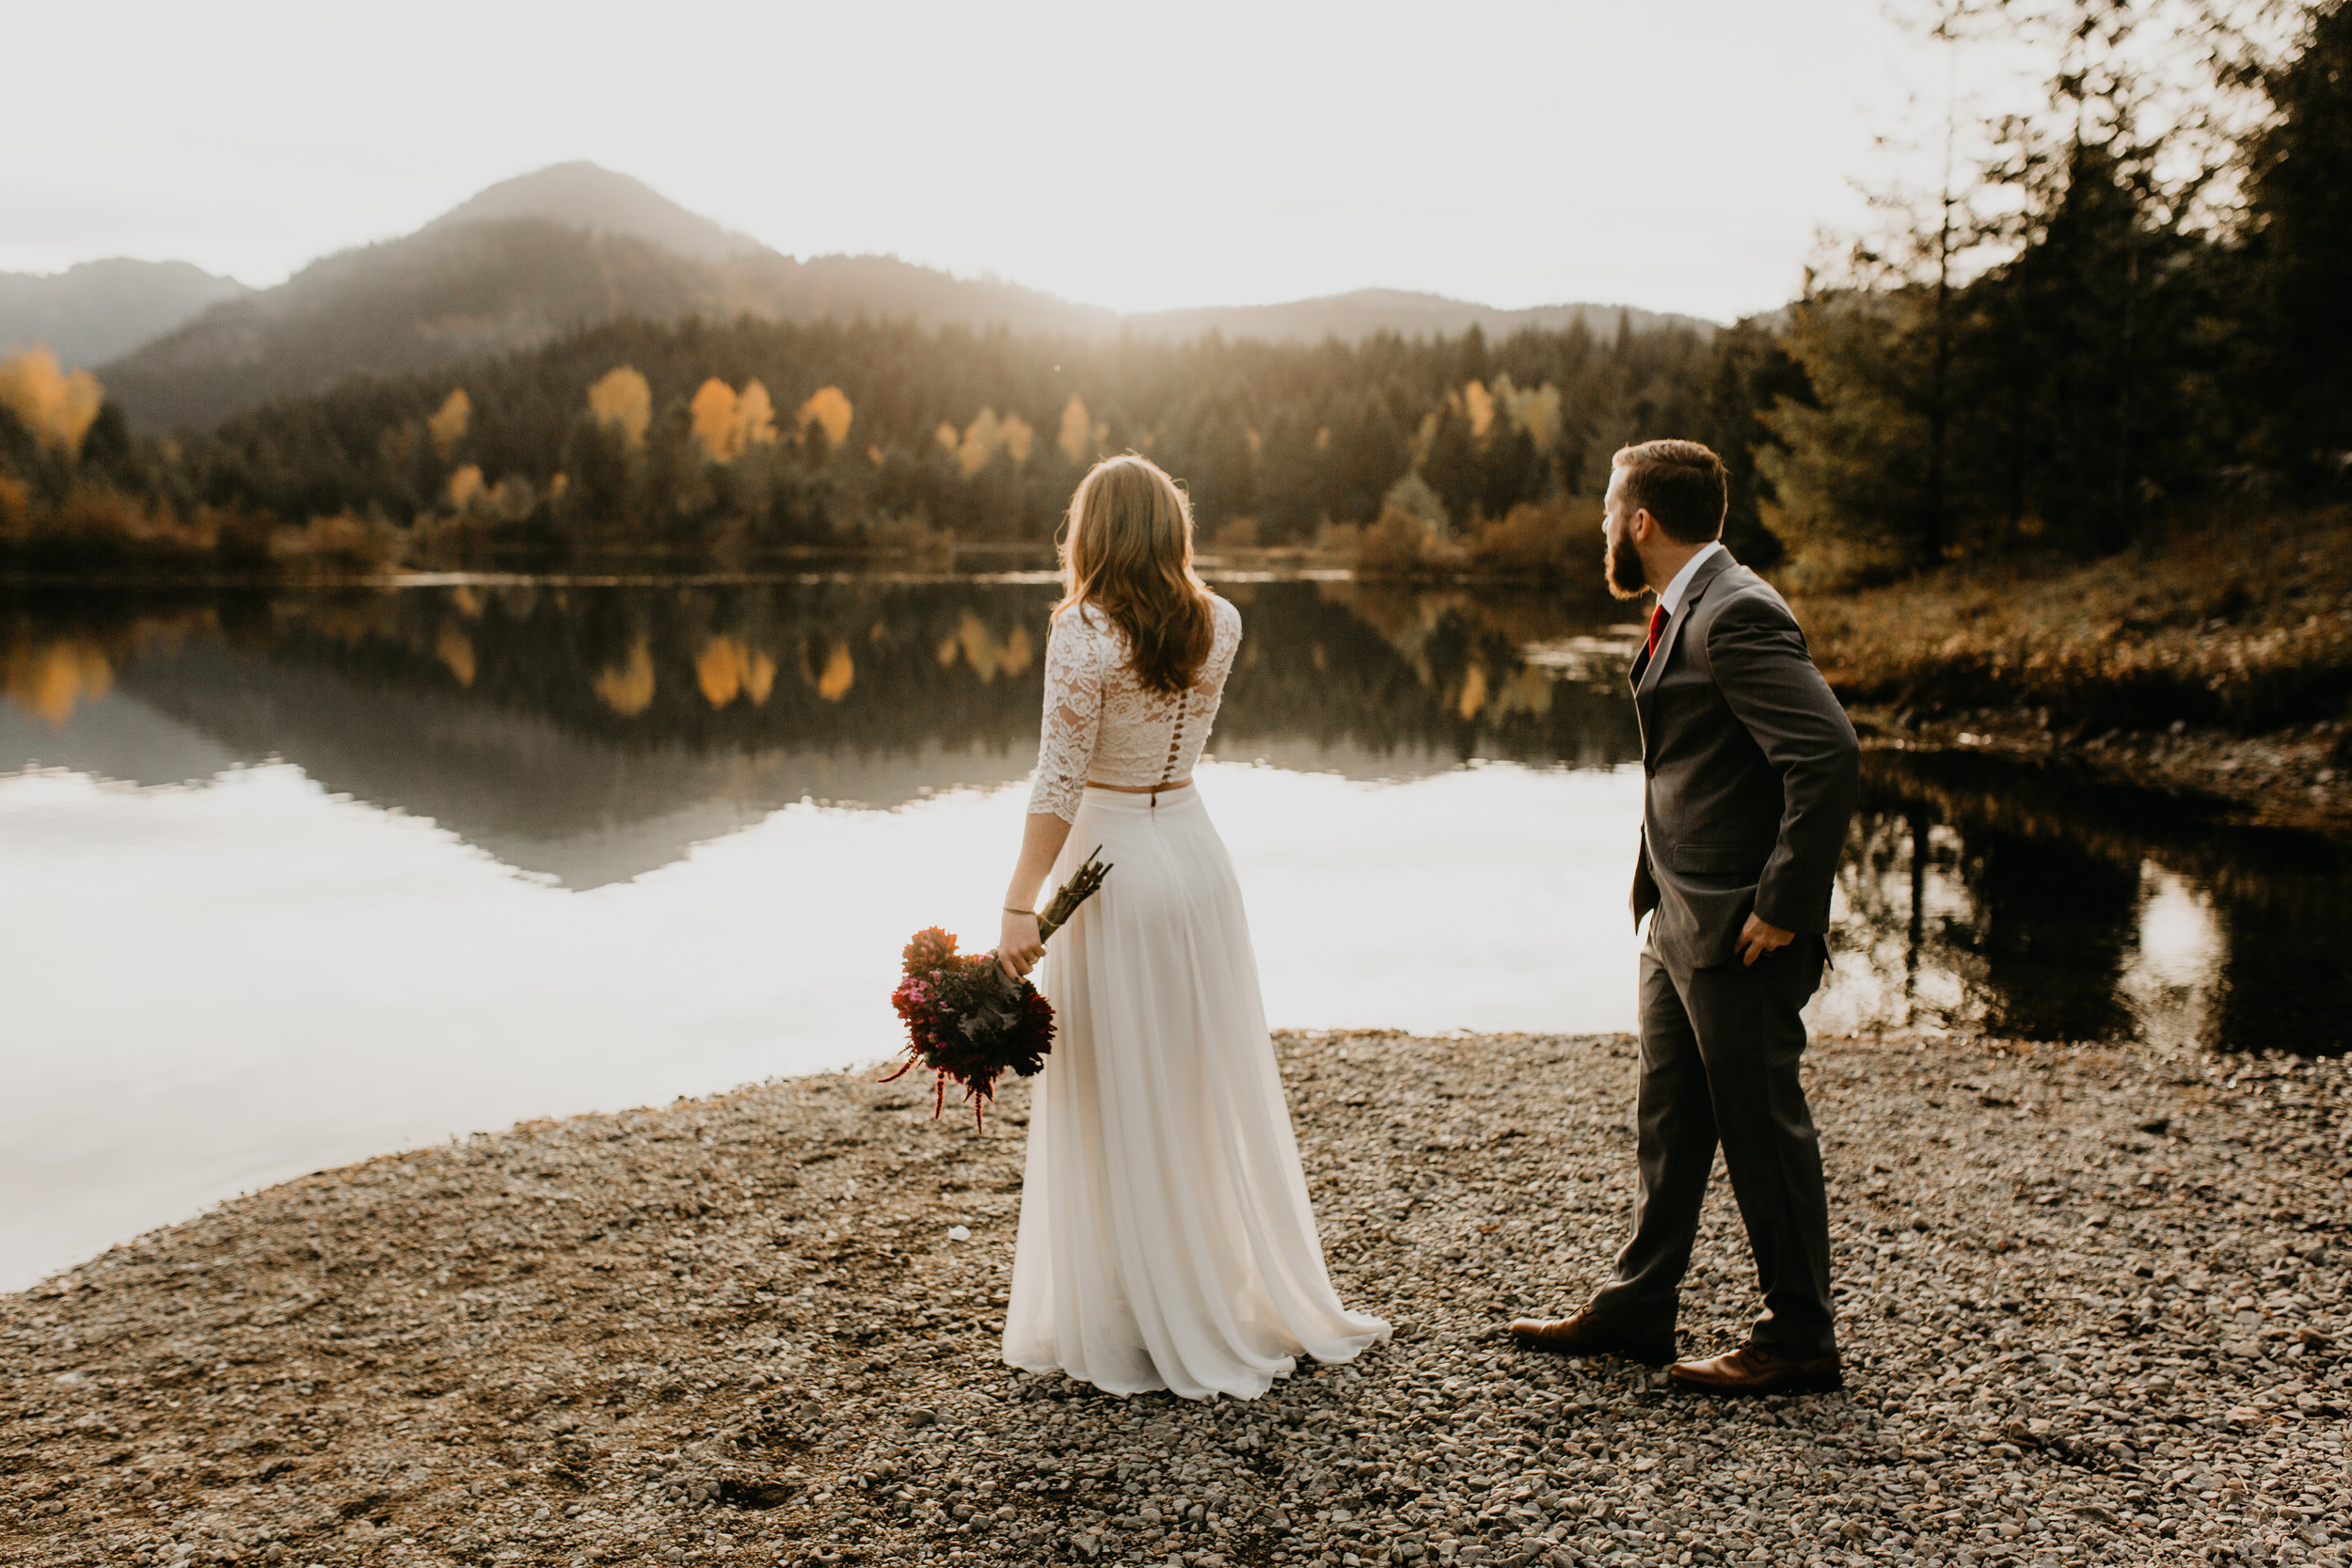 nicole-daacke-photography-mountain-view-elopement-at-gold-creek-pond-snoqualmie-washington-wa-elopement-photographer-photography-adventure-elopement-in-washington-fall-lakeside-golden-sunset-boho-fun-bride-0325.jpg